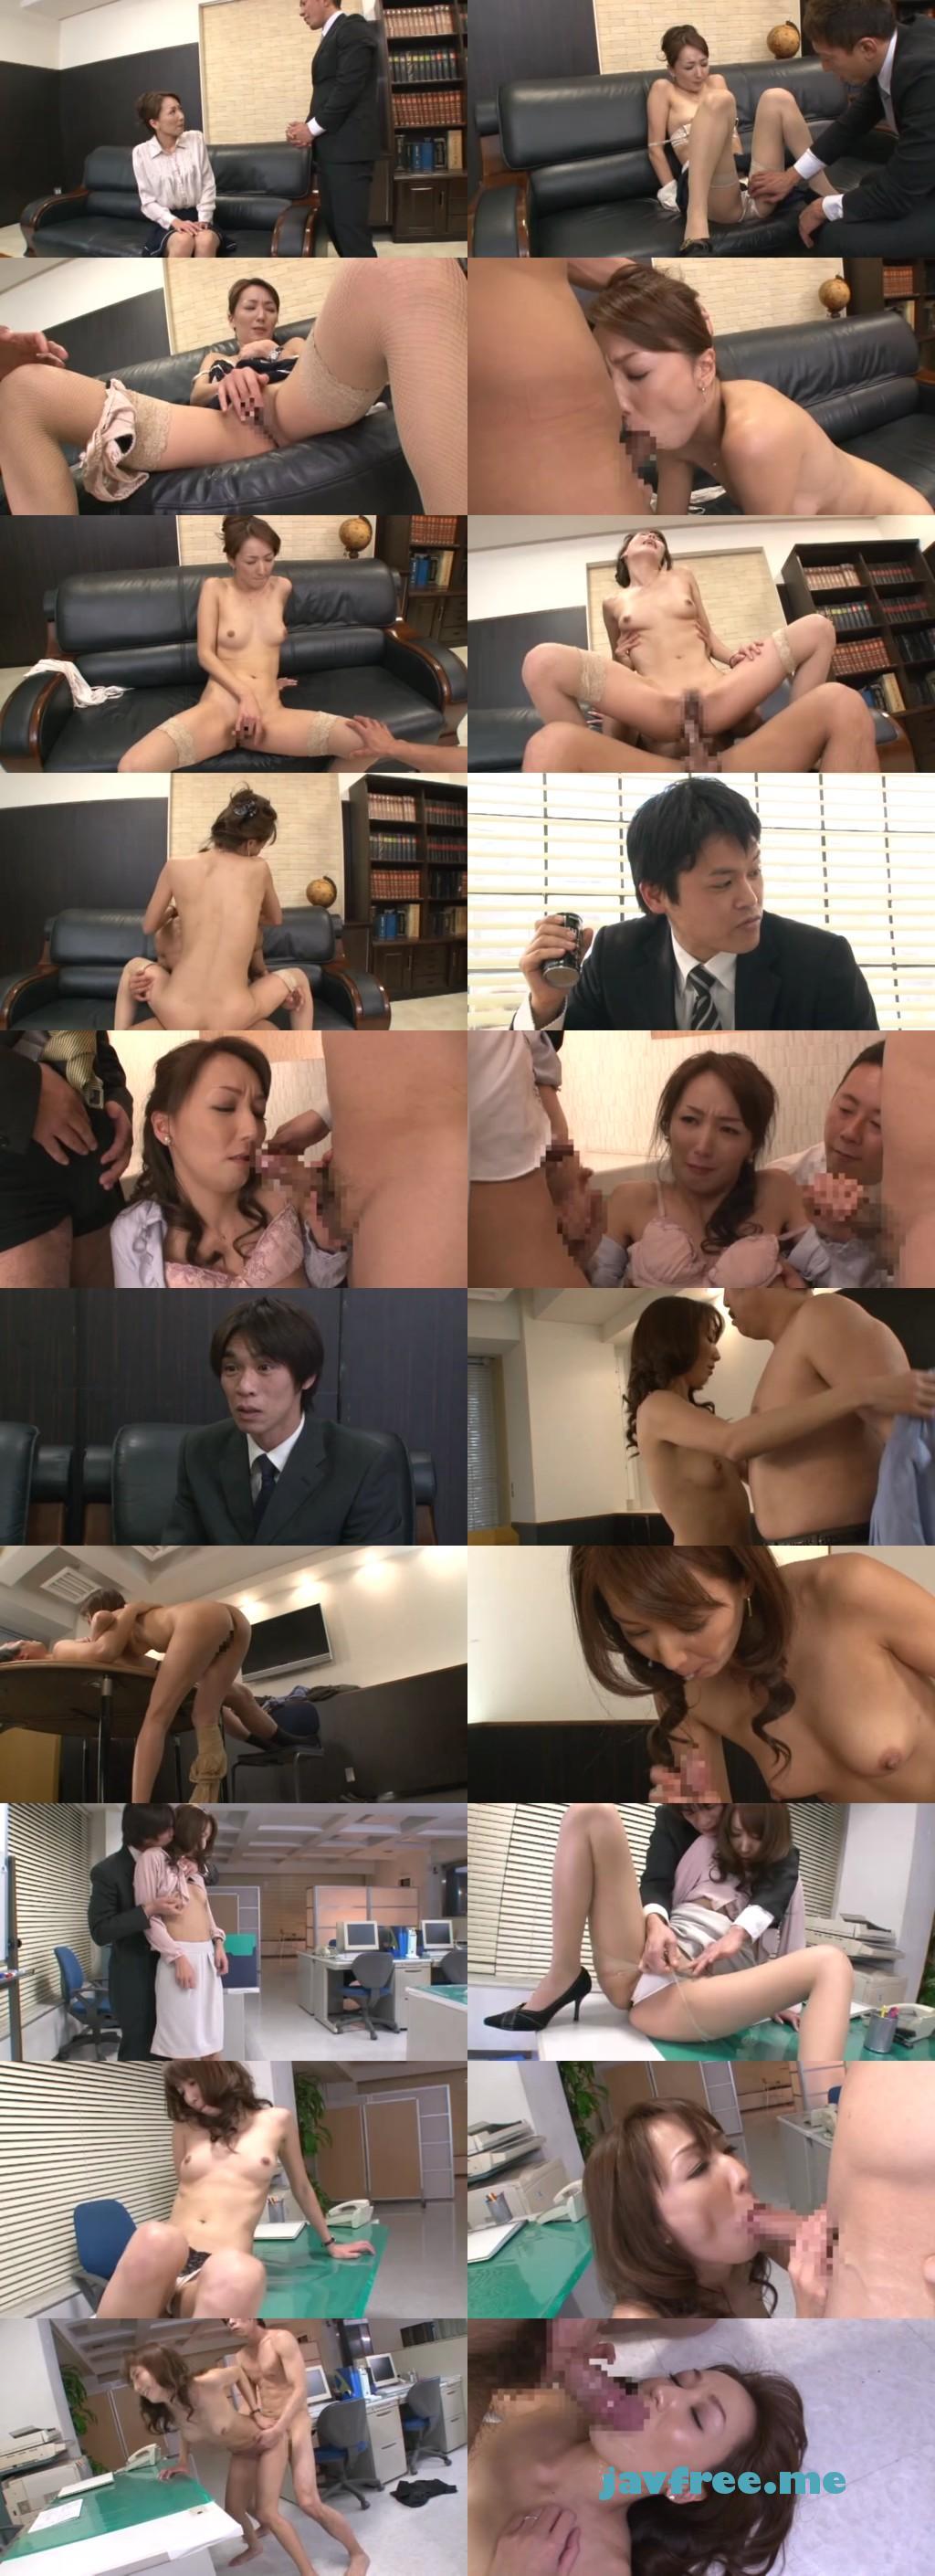 [MOMJ 201] 肉欲接待課におちた妻 志保 志保 MOMJ